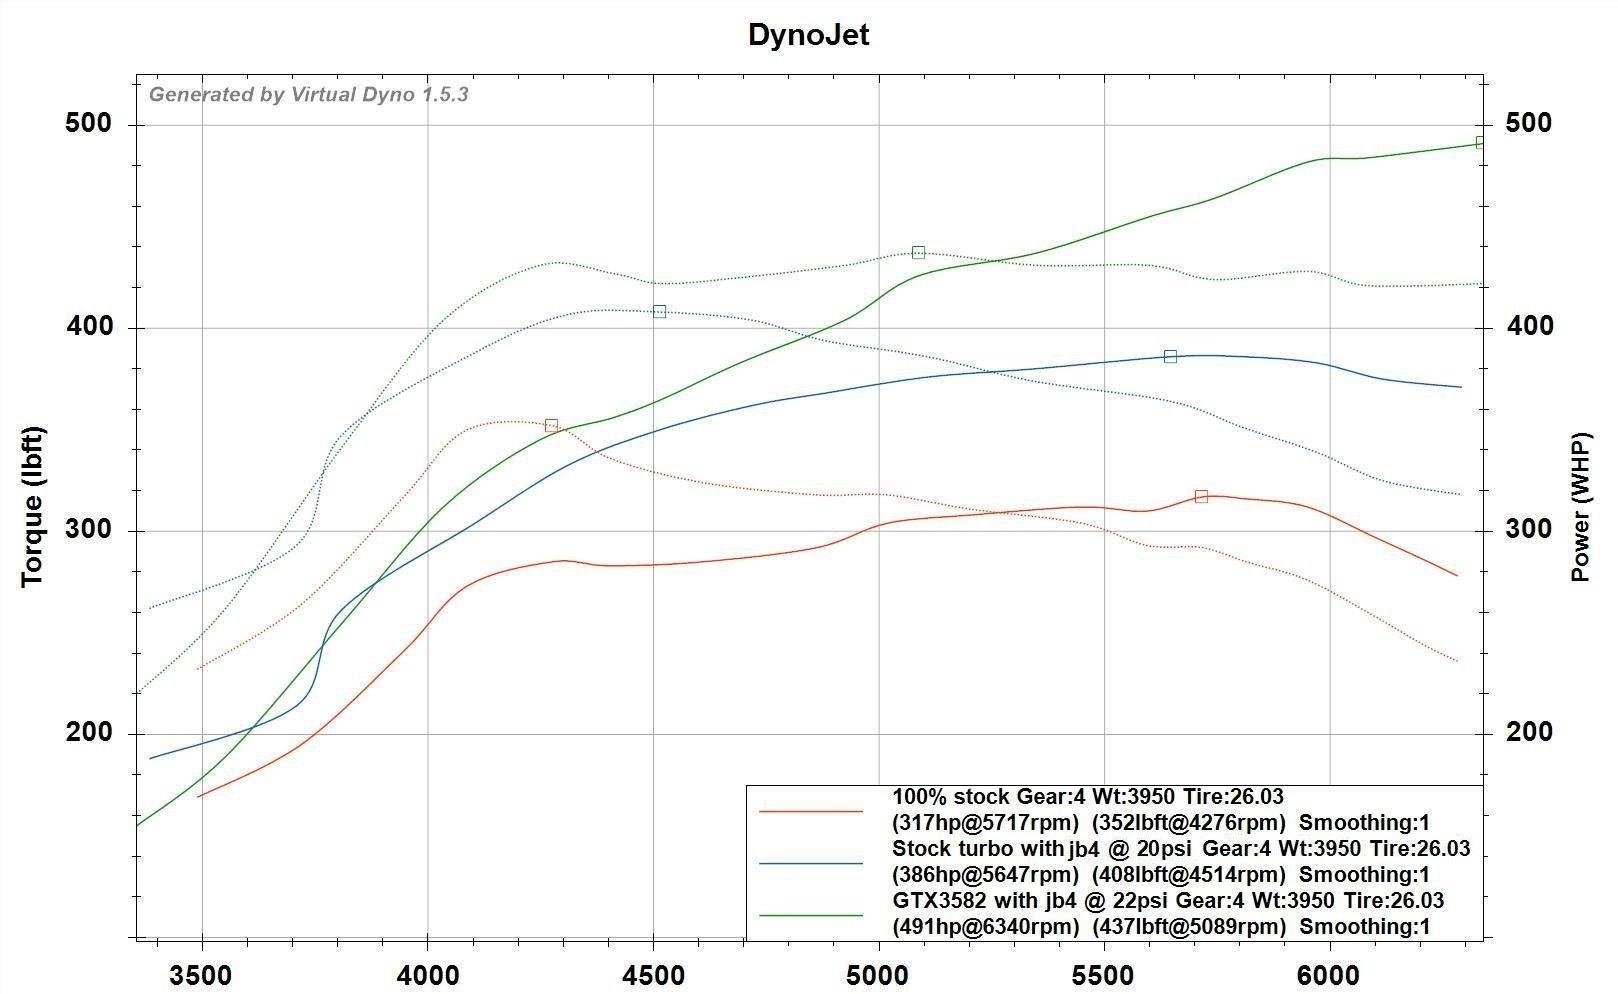 Hybrid GTX3582 turbo upgrade - AudiWorld Forums